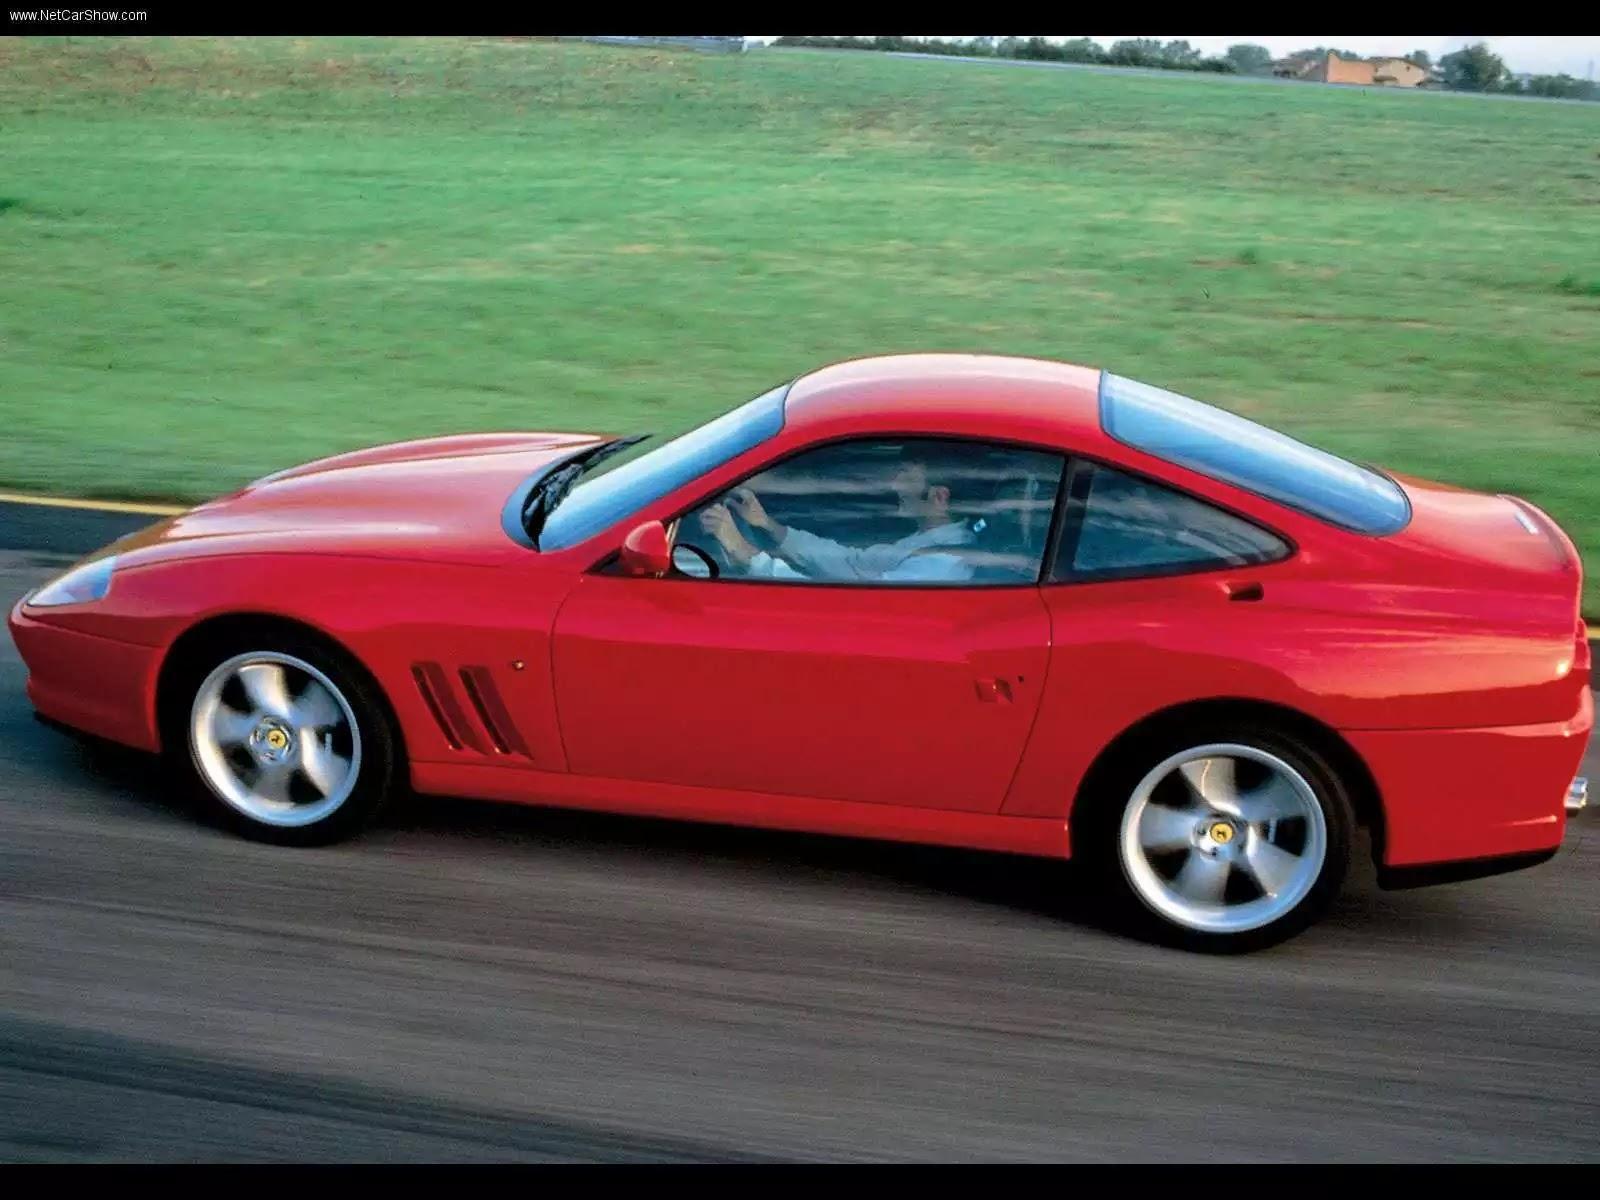 Hình ảnh siêu xe Ferrari 550 Maranello 2001 & nội ngoại thất